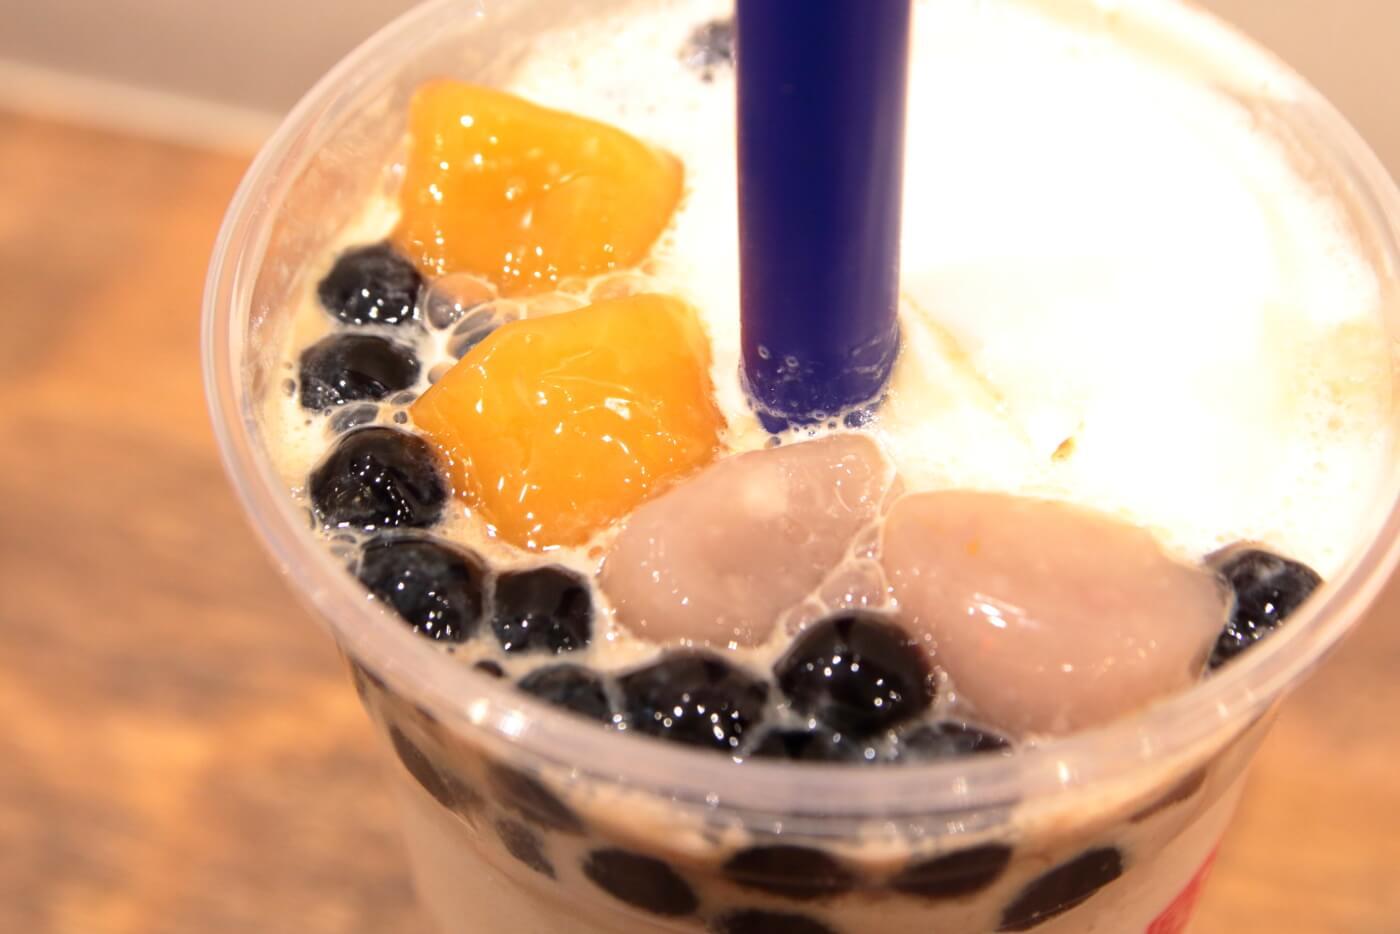 台湾甜商店 高知帯屋町店 台湾満足スムージー